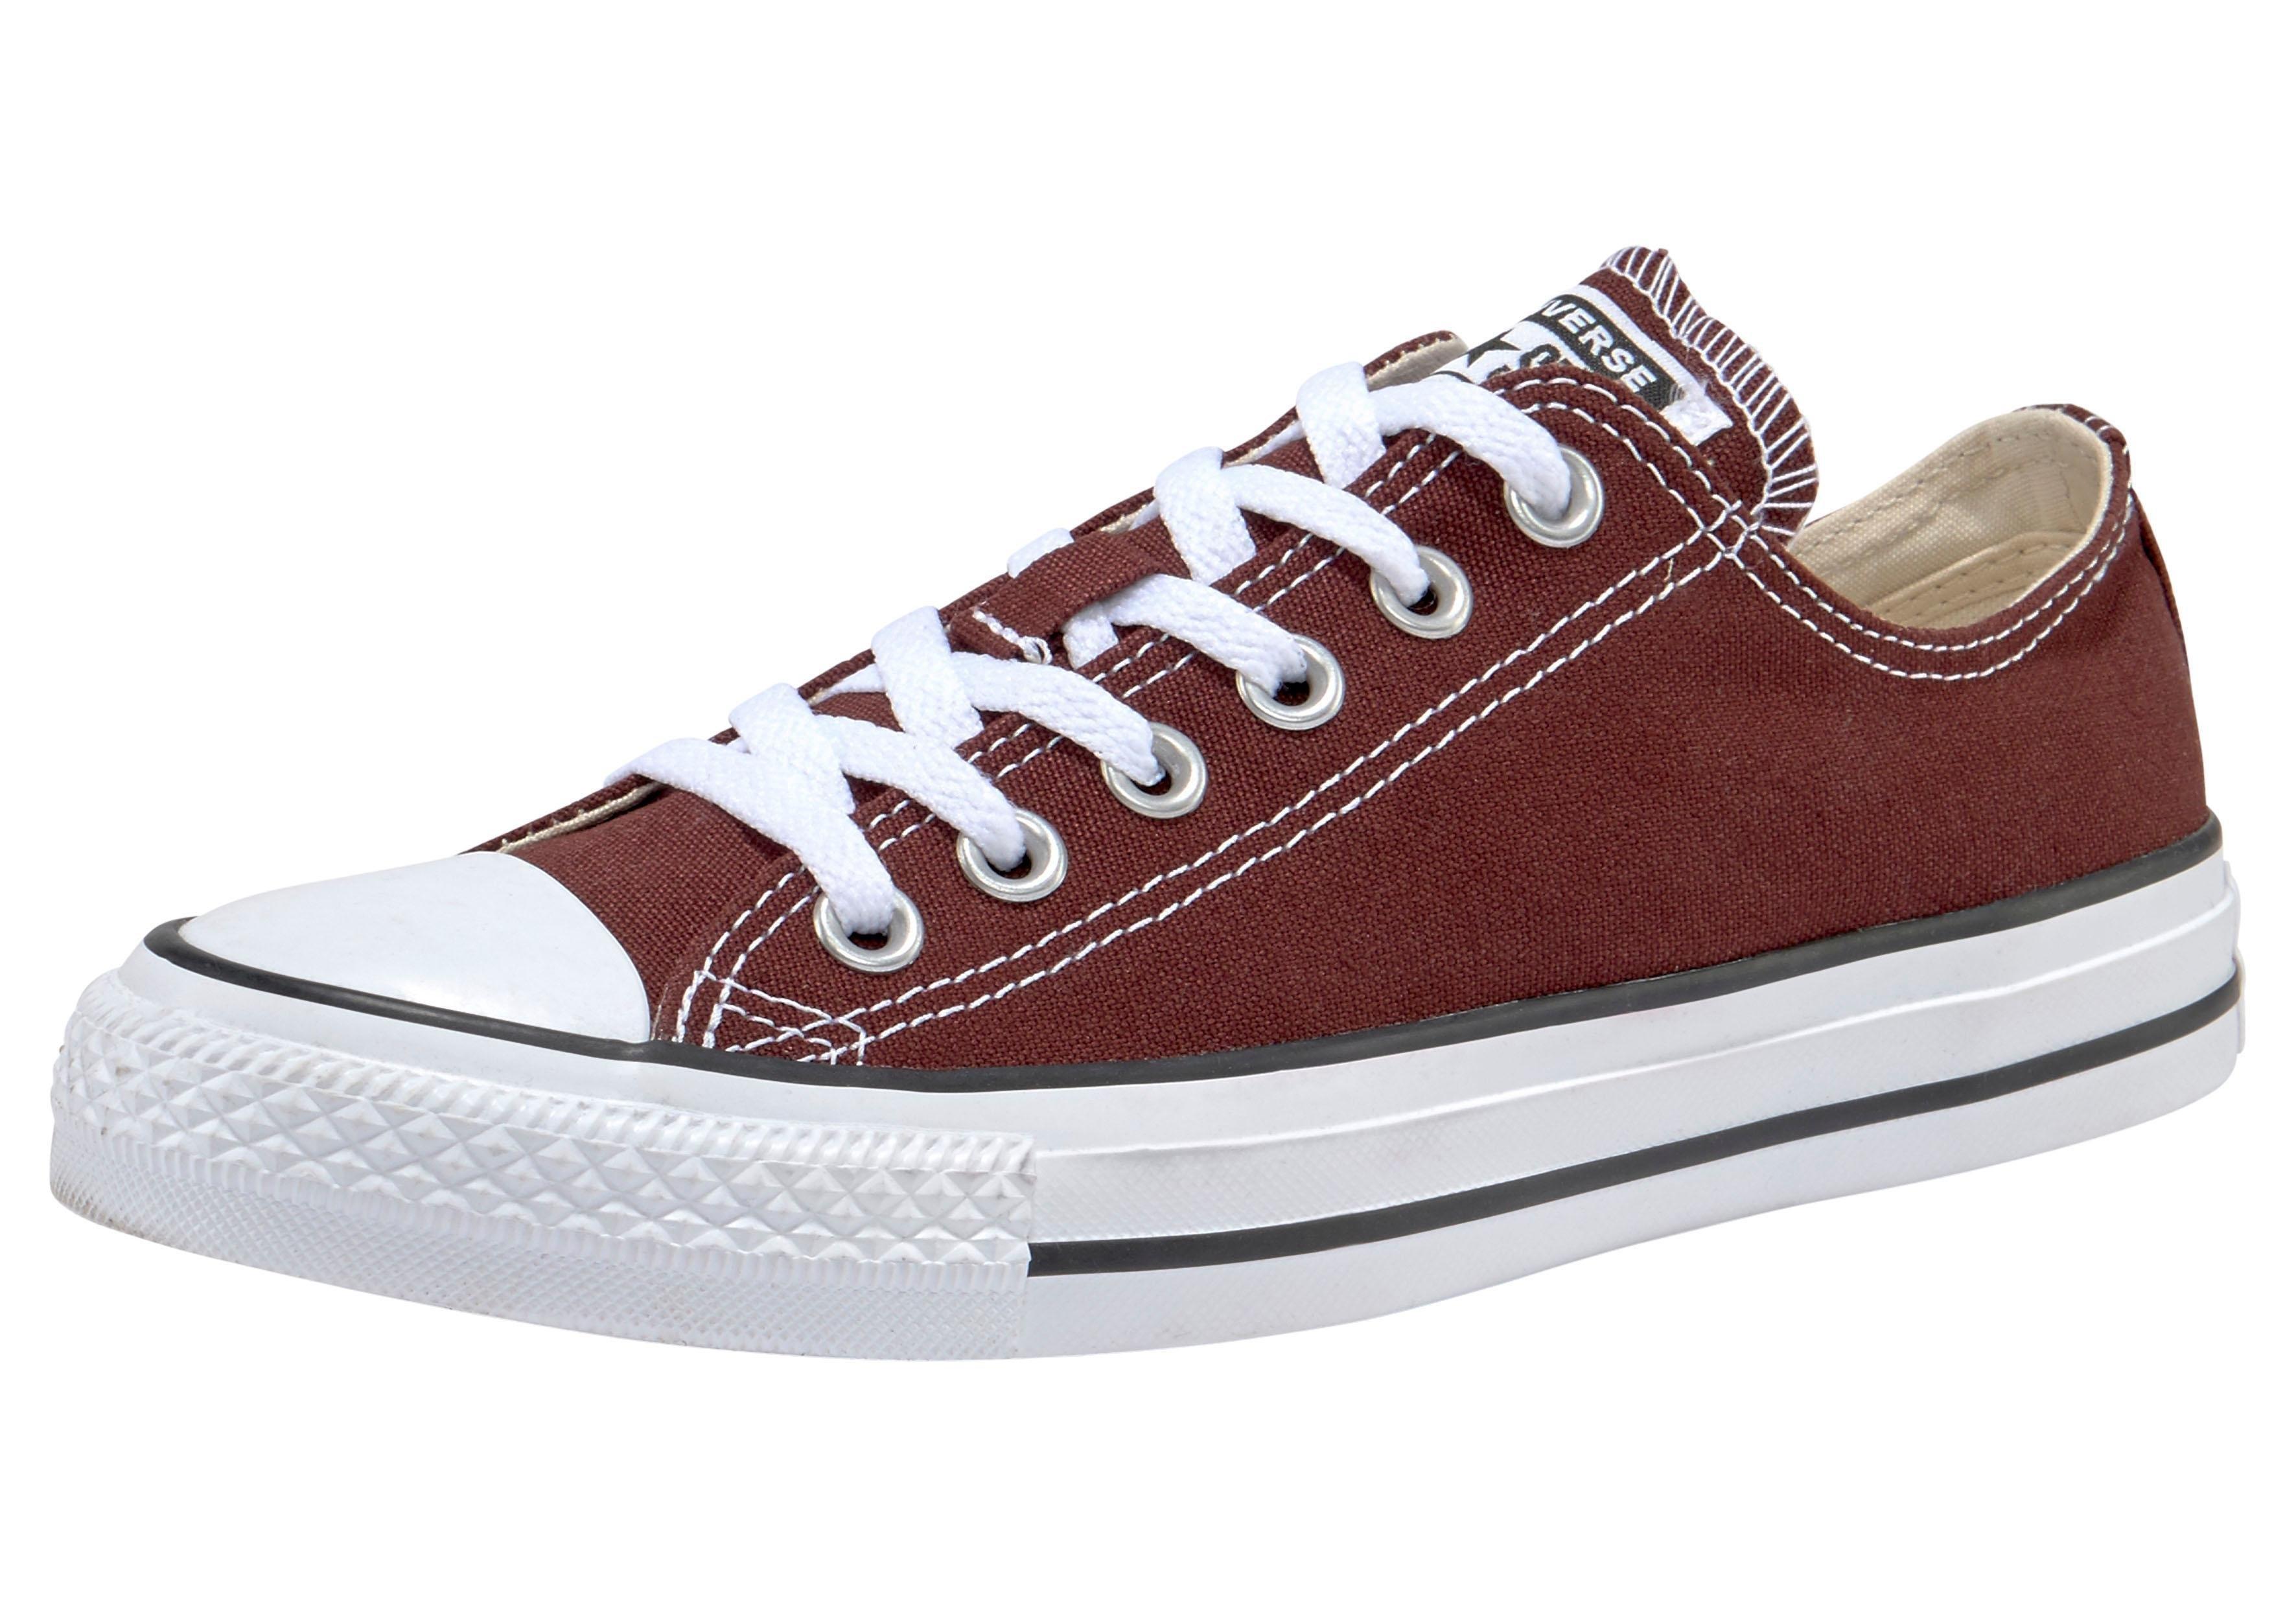 24051f9cd1e All Stars kopen  Keuze uit ruim 290 All stars schoenen